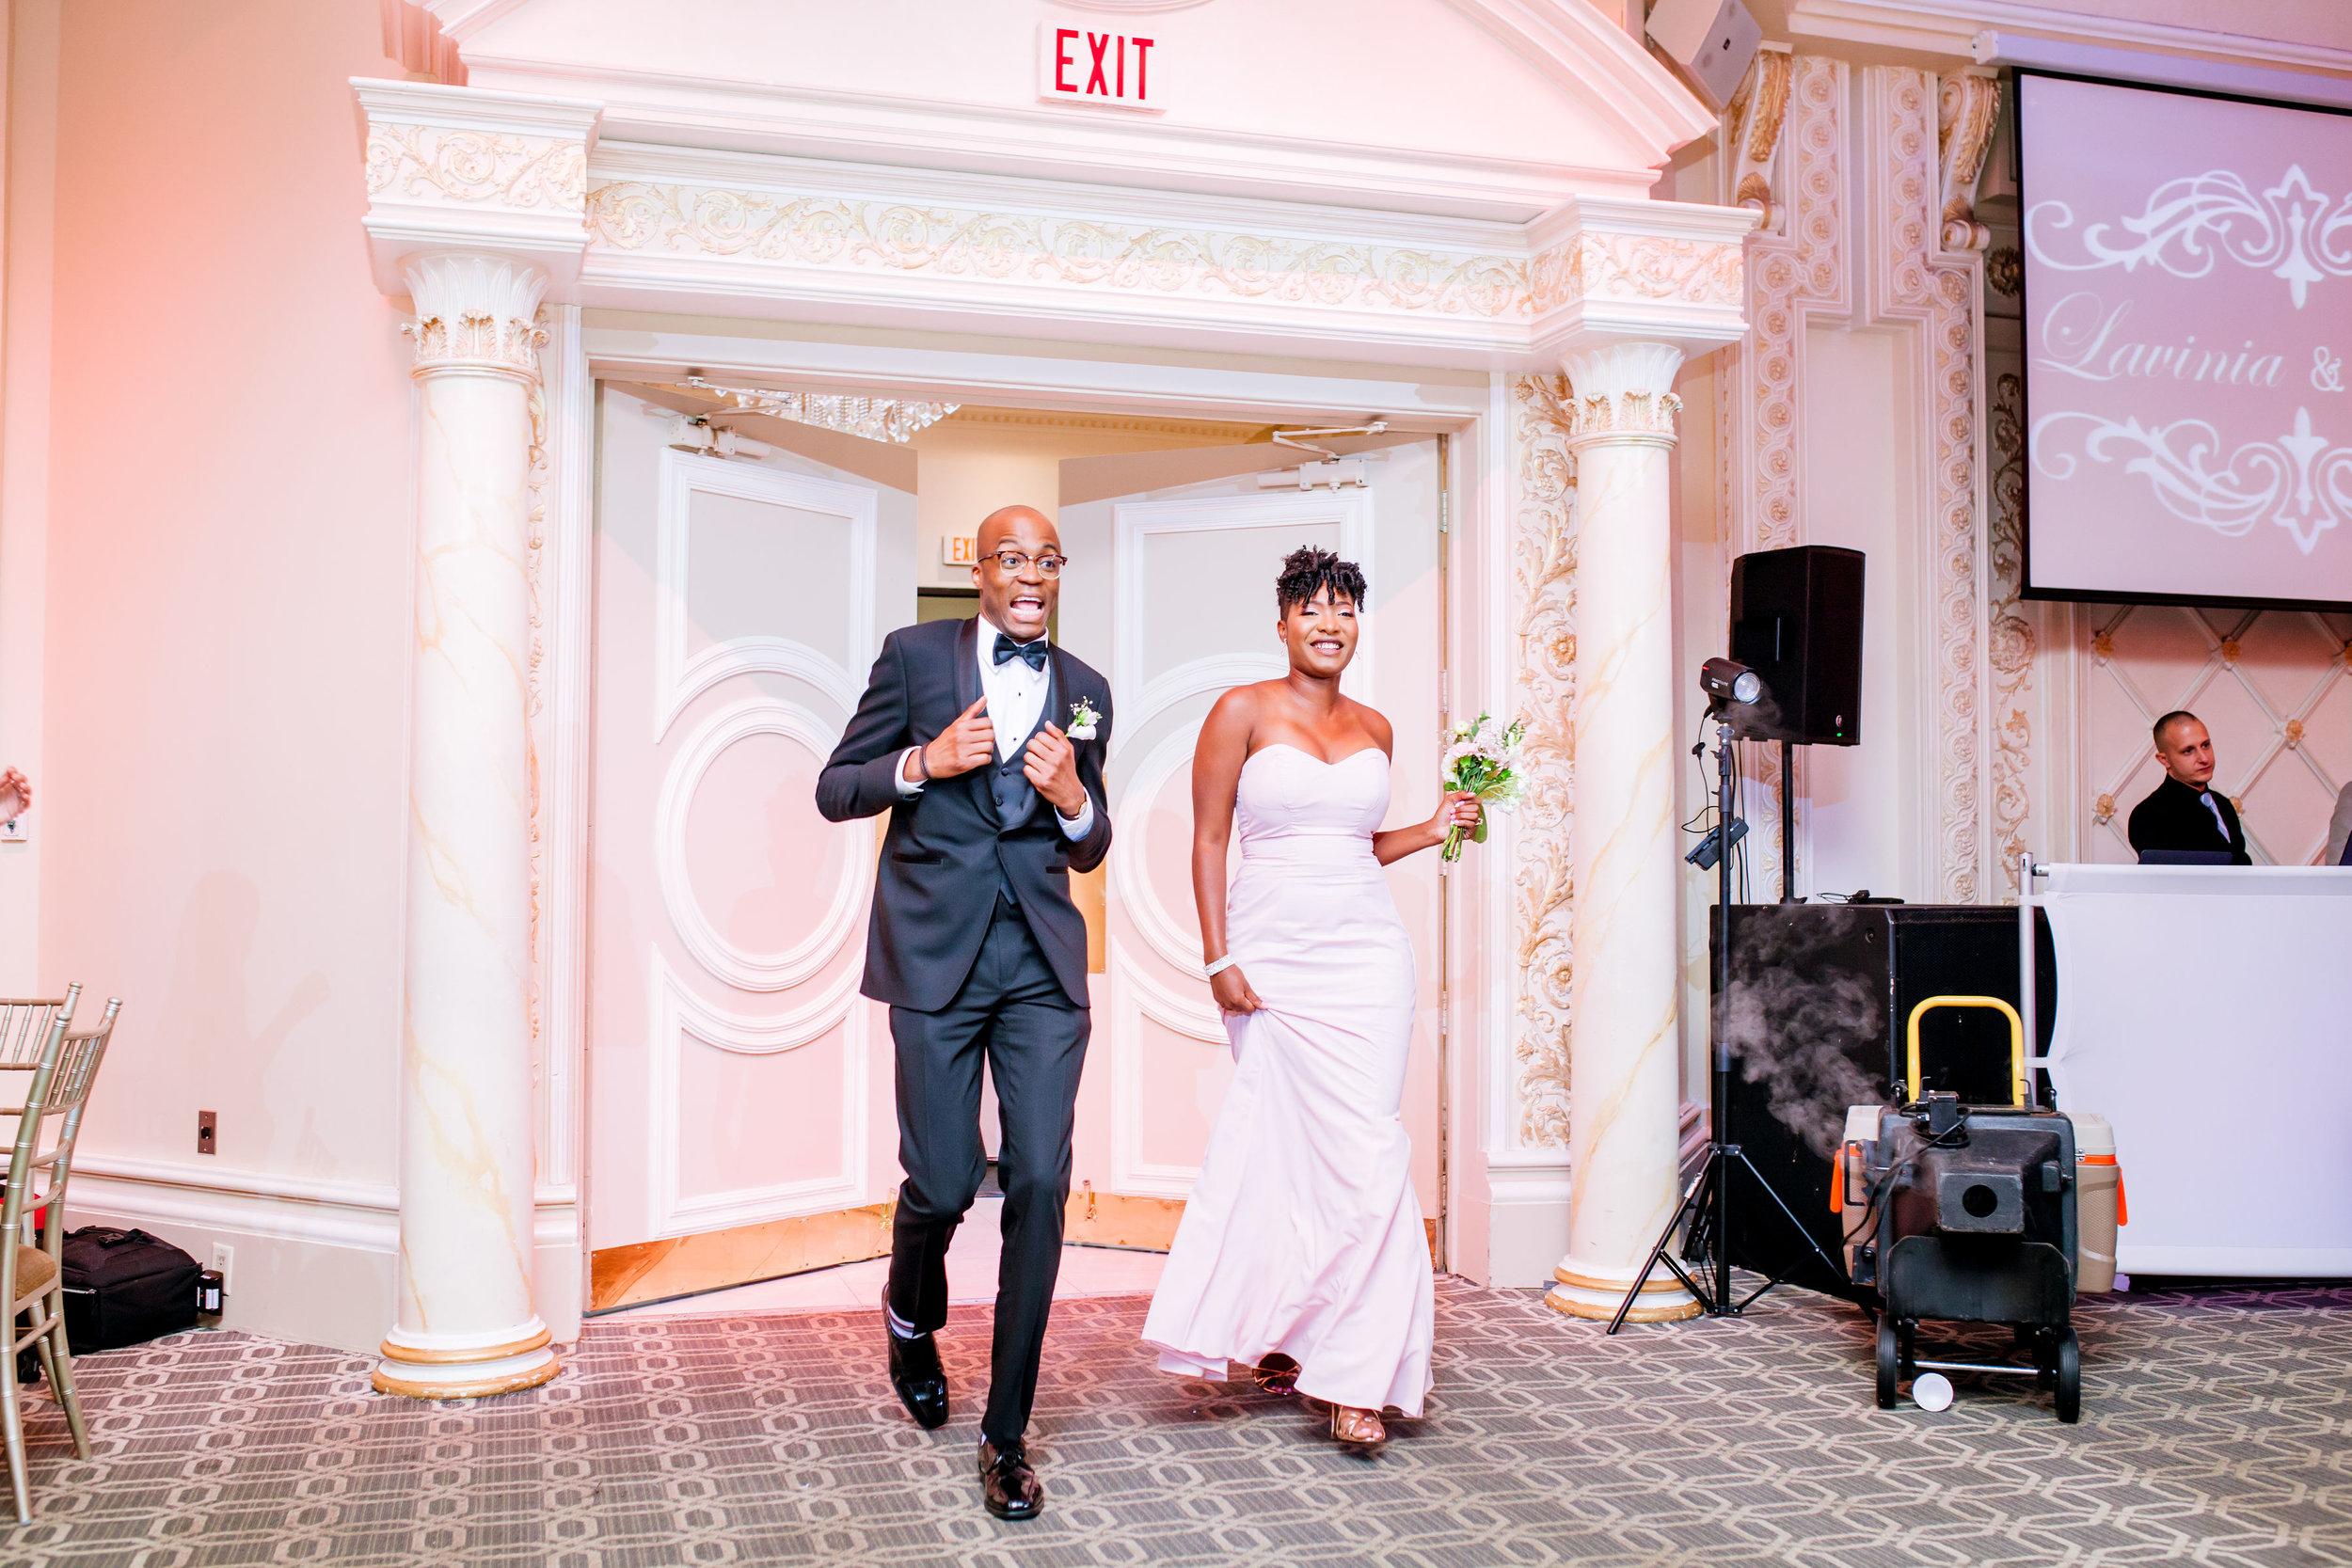 Karimah_Gheddai_Photography_Catholic_Wedding_Alexander_Muir_Gardens_Paradise_Banquet_Hall_13